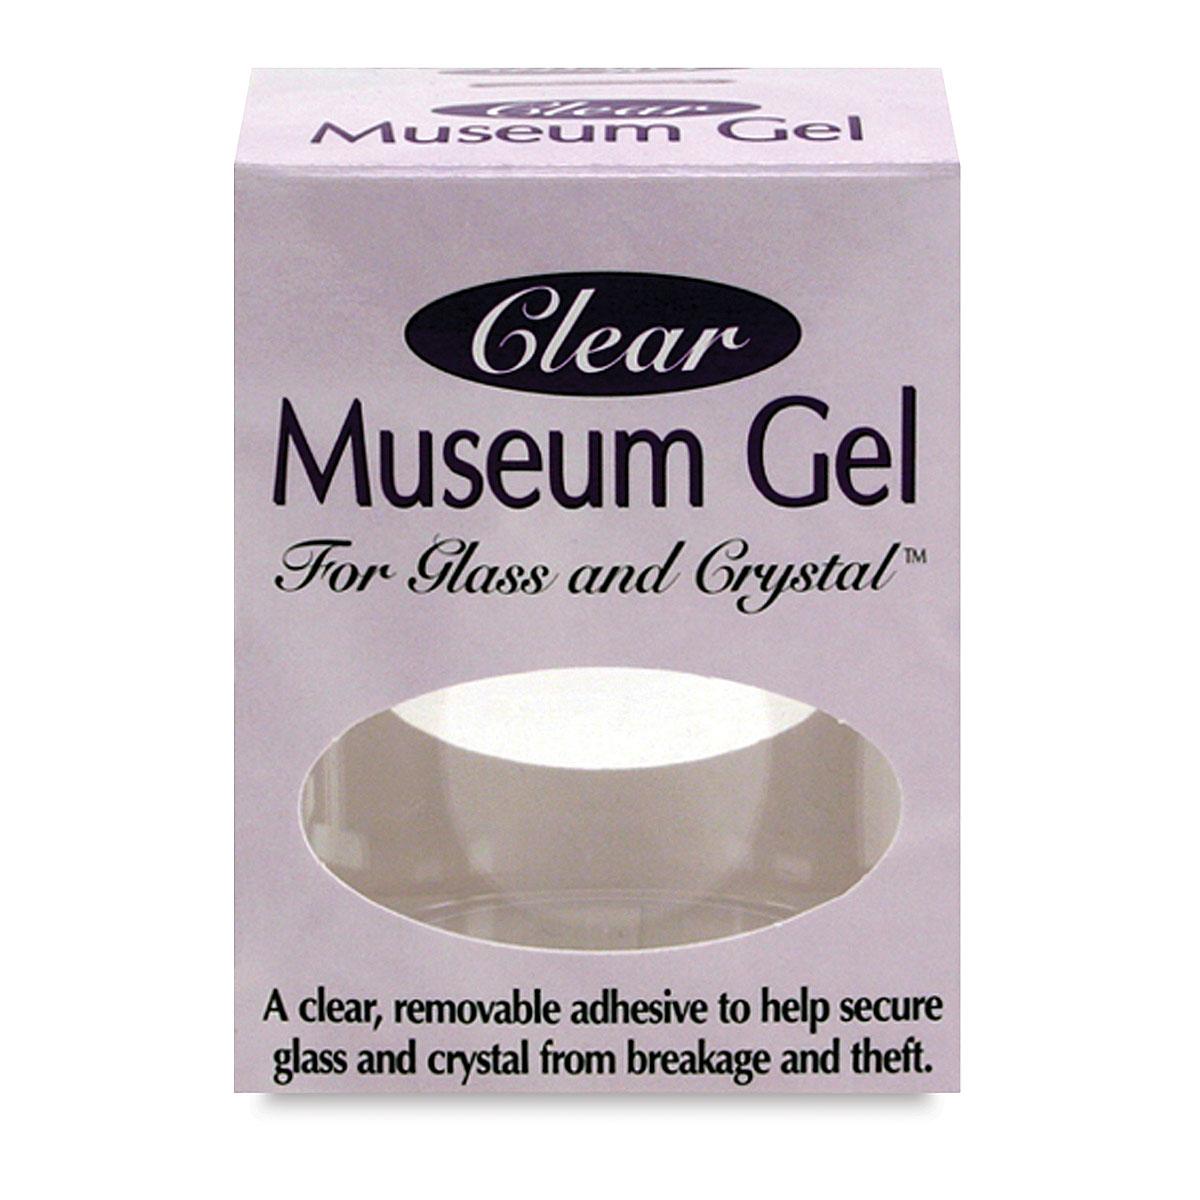 Museum Gel - 4 oz, Clear